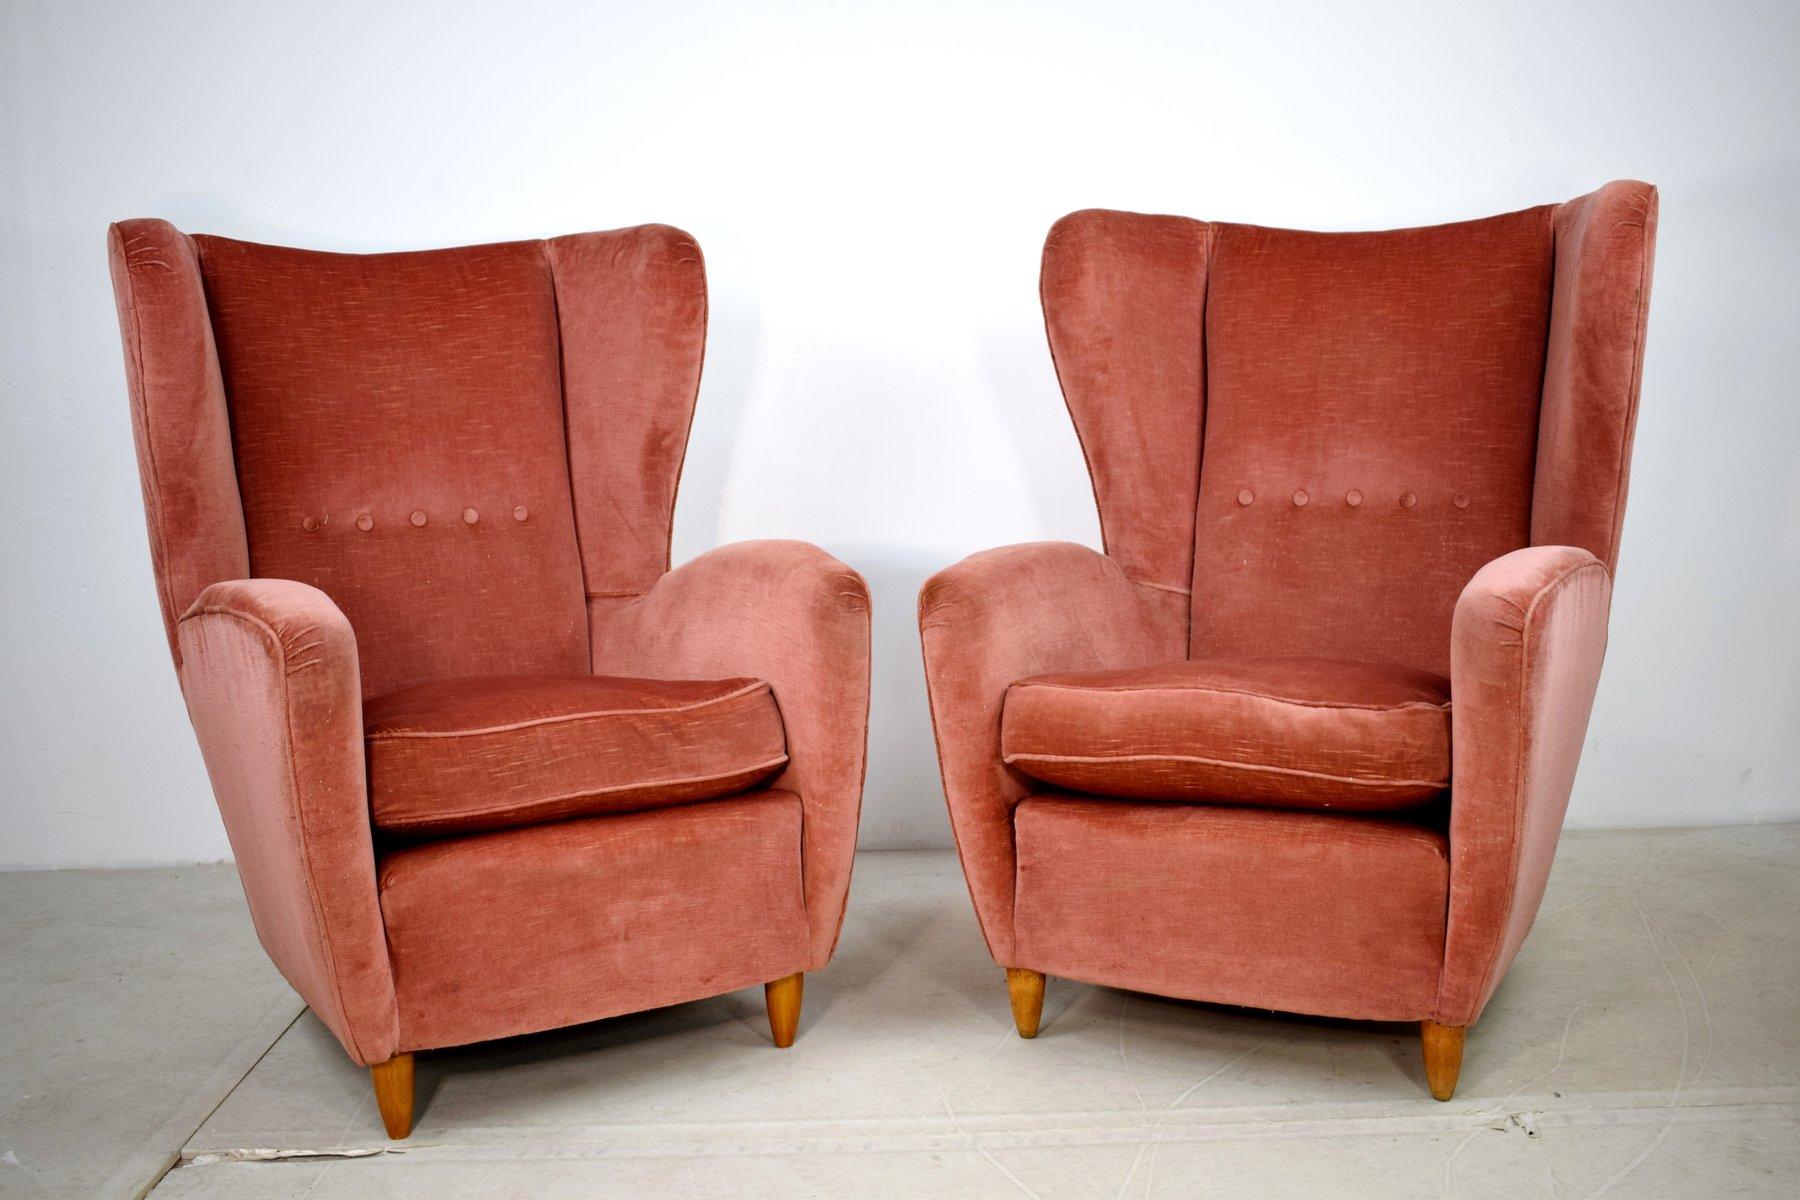 Beau Vintage Armchairs, 1950s, Set Of 2